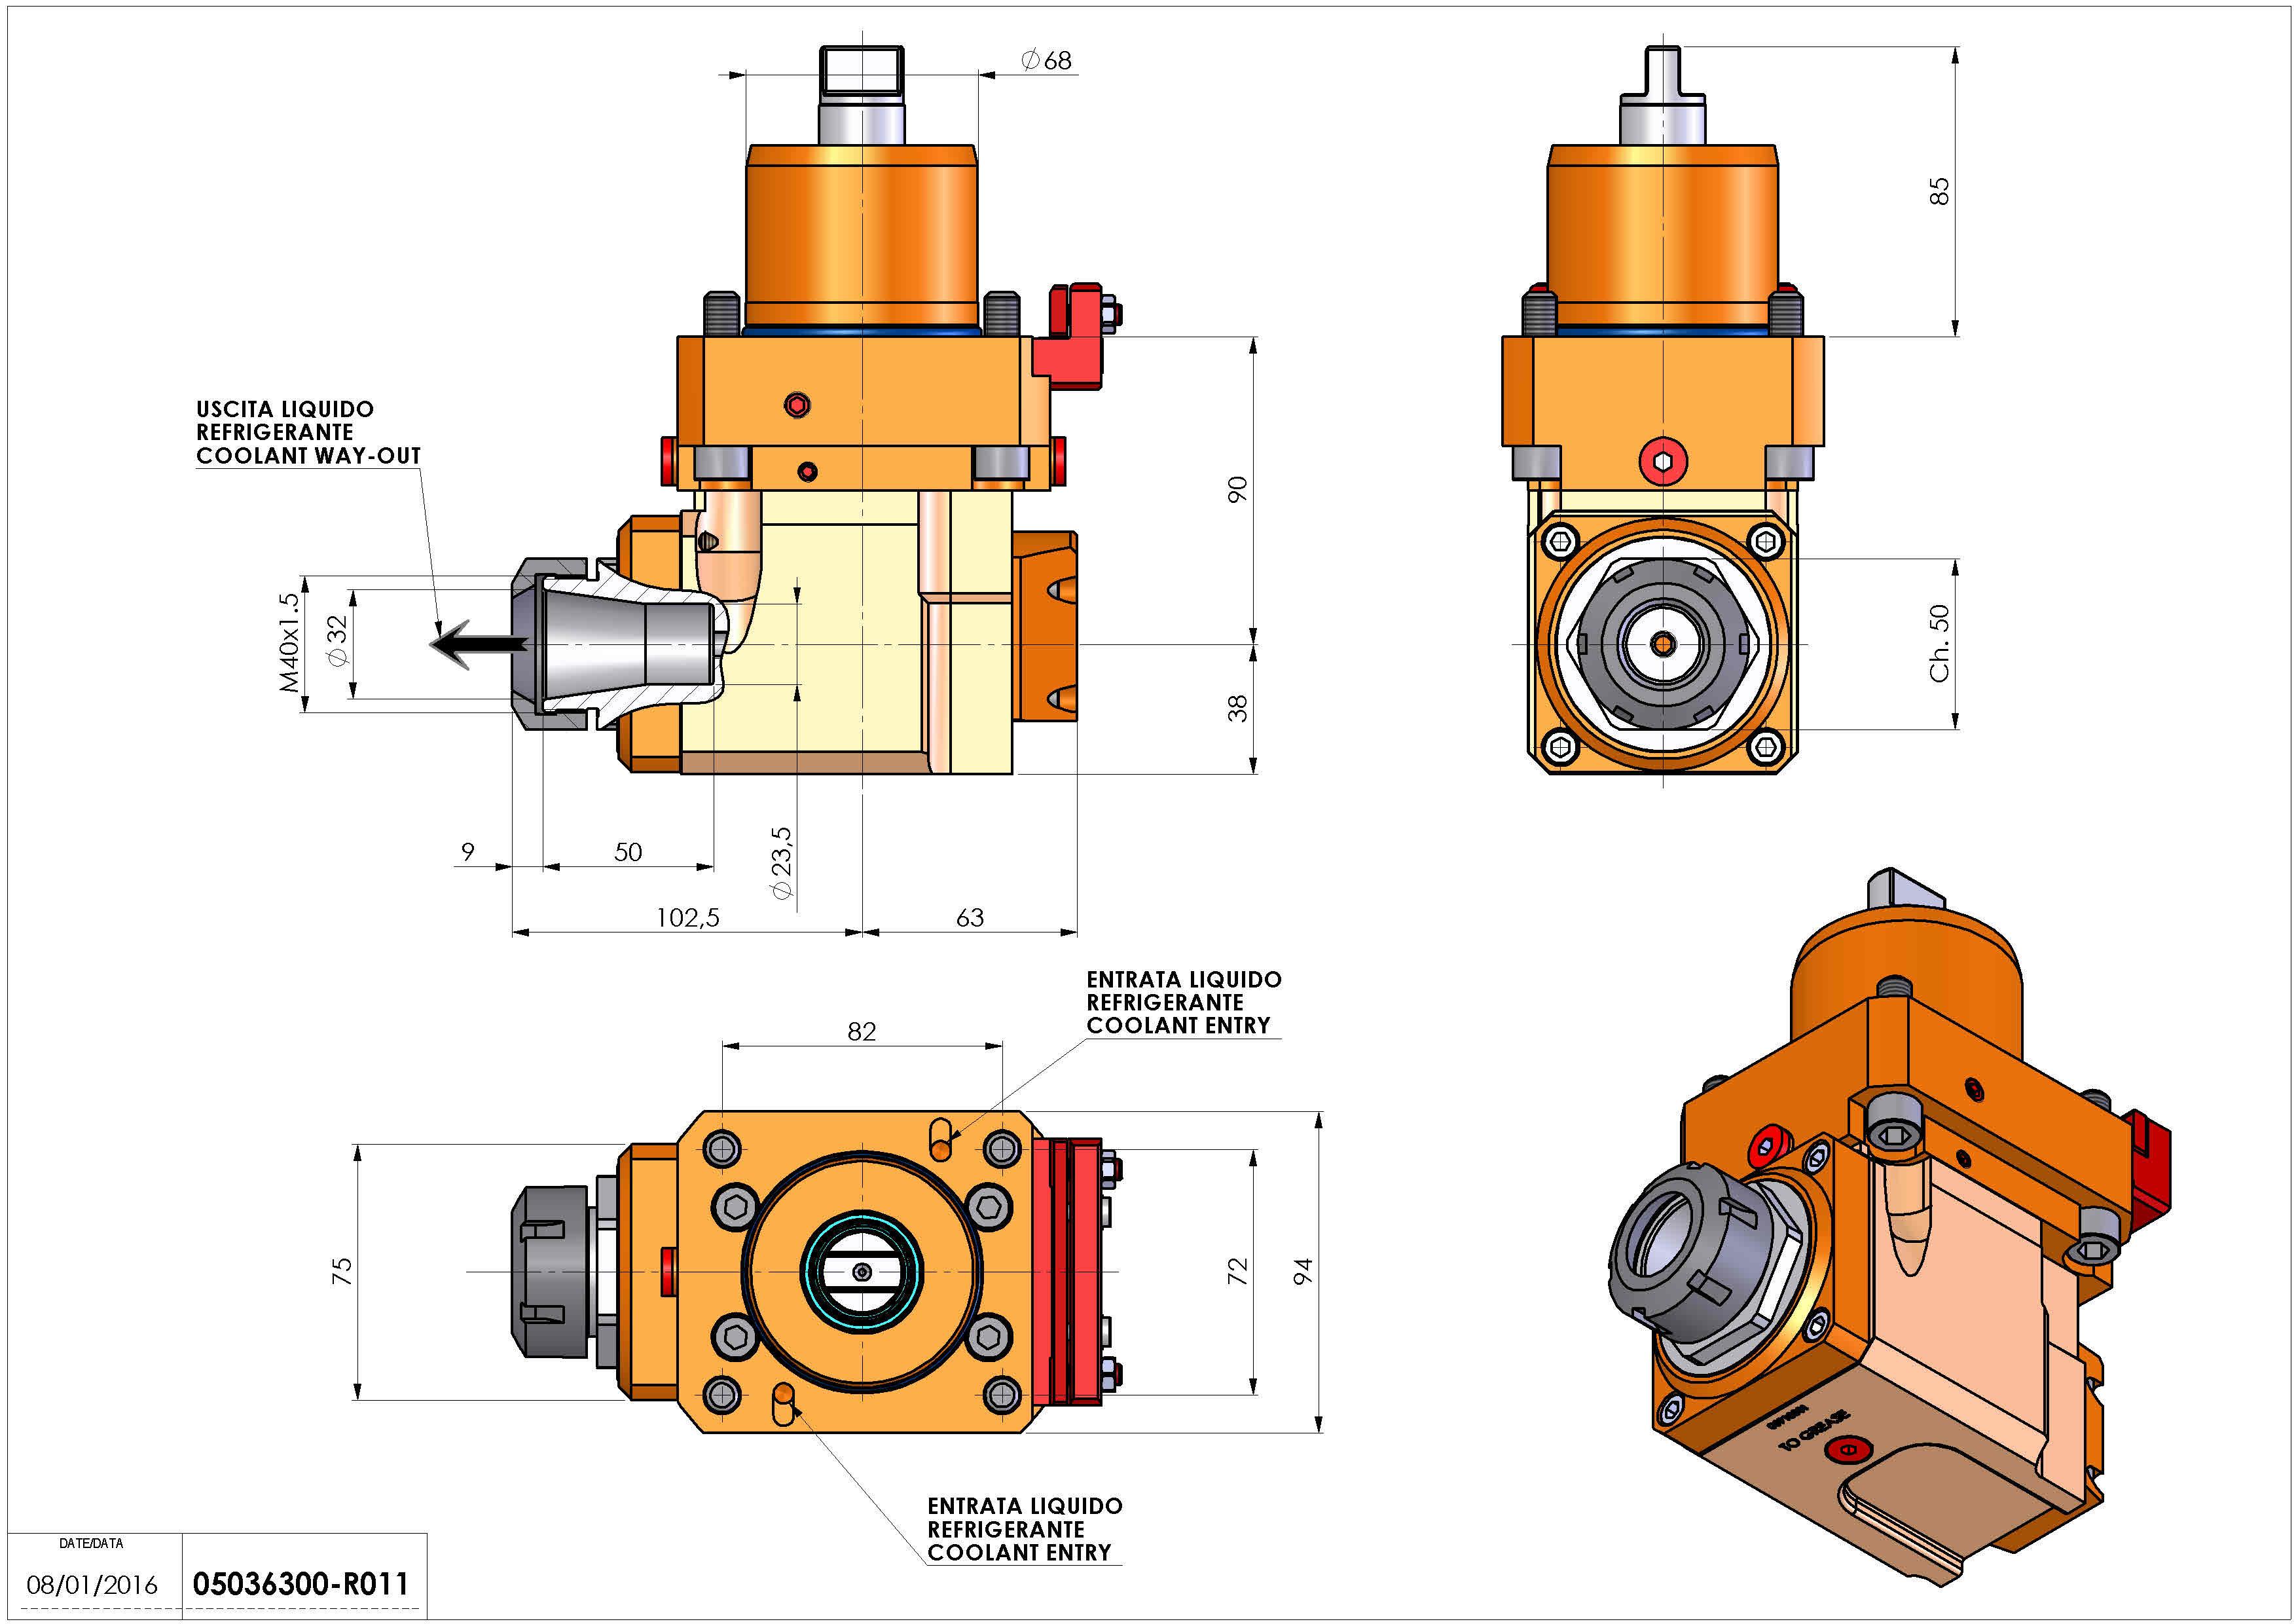 Technical image - LT-A D68 ER32 RF H90 TWJ.